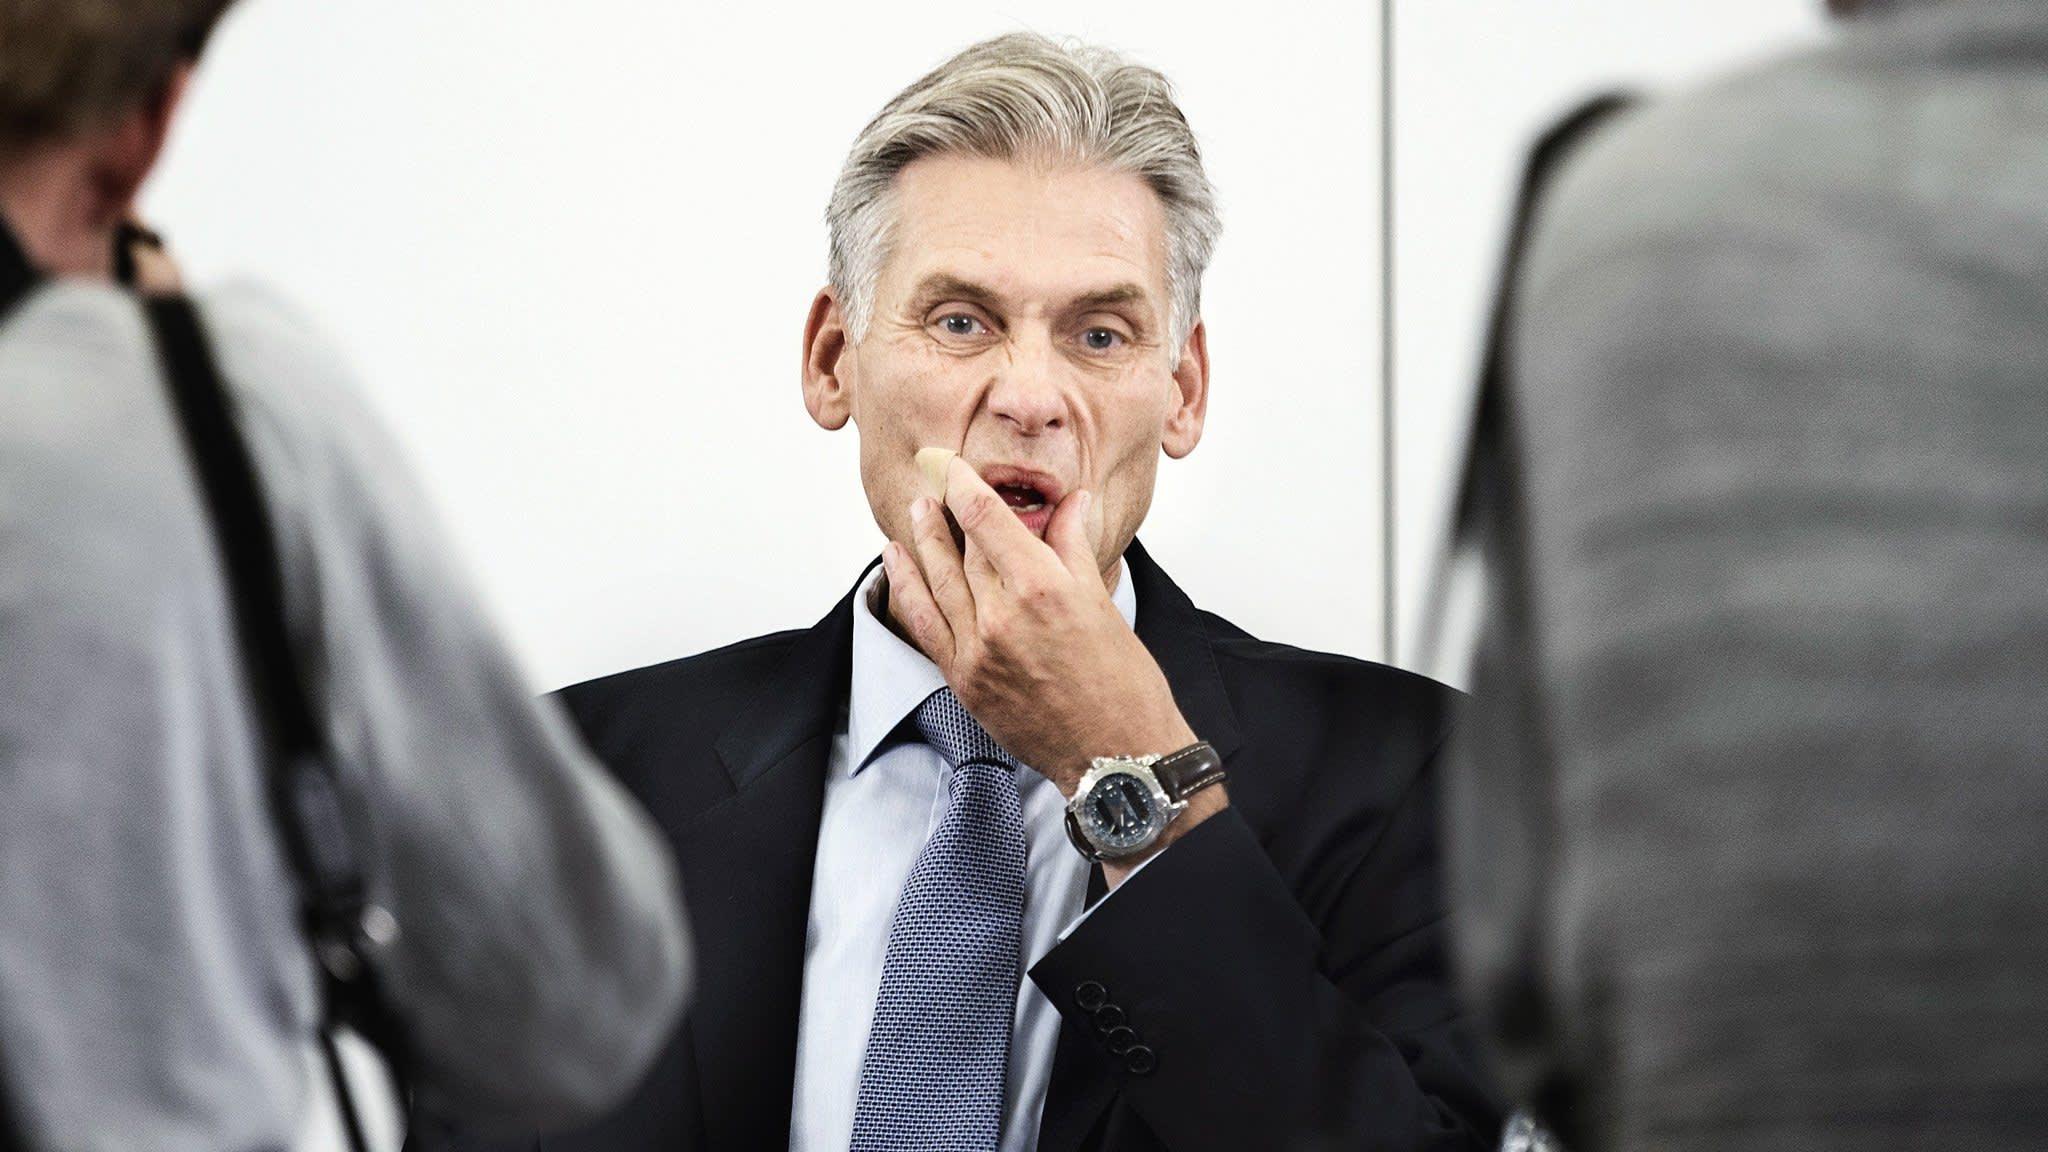 Danske Bank board ousts chief executive following €200bn scandal